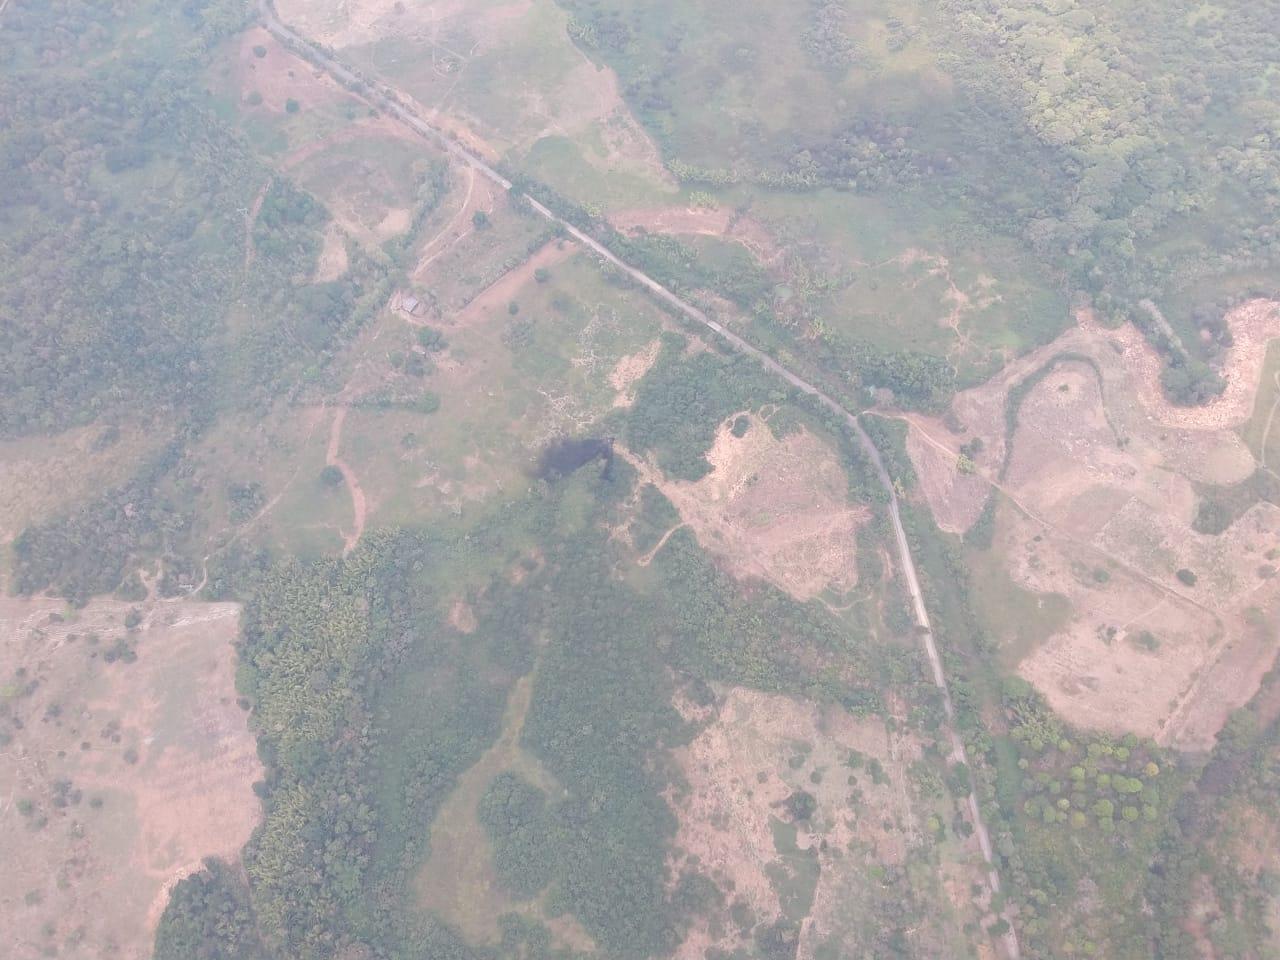 Ecopetrol activó plan de contingencia por voladura de oleducto Caño Limón Coveñas